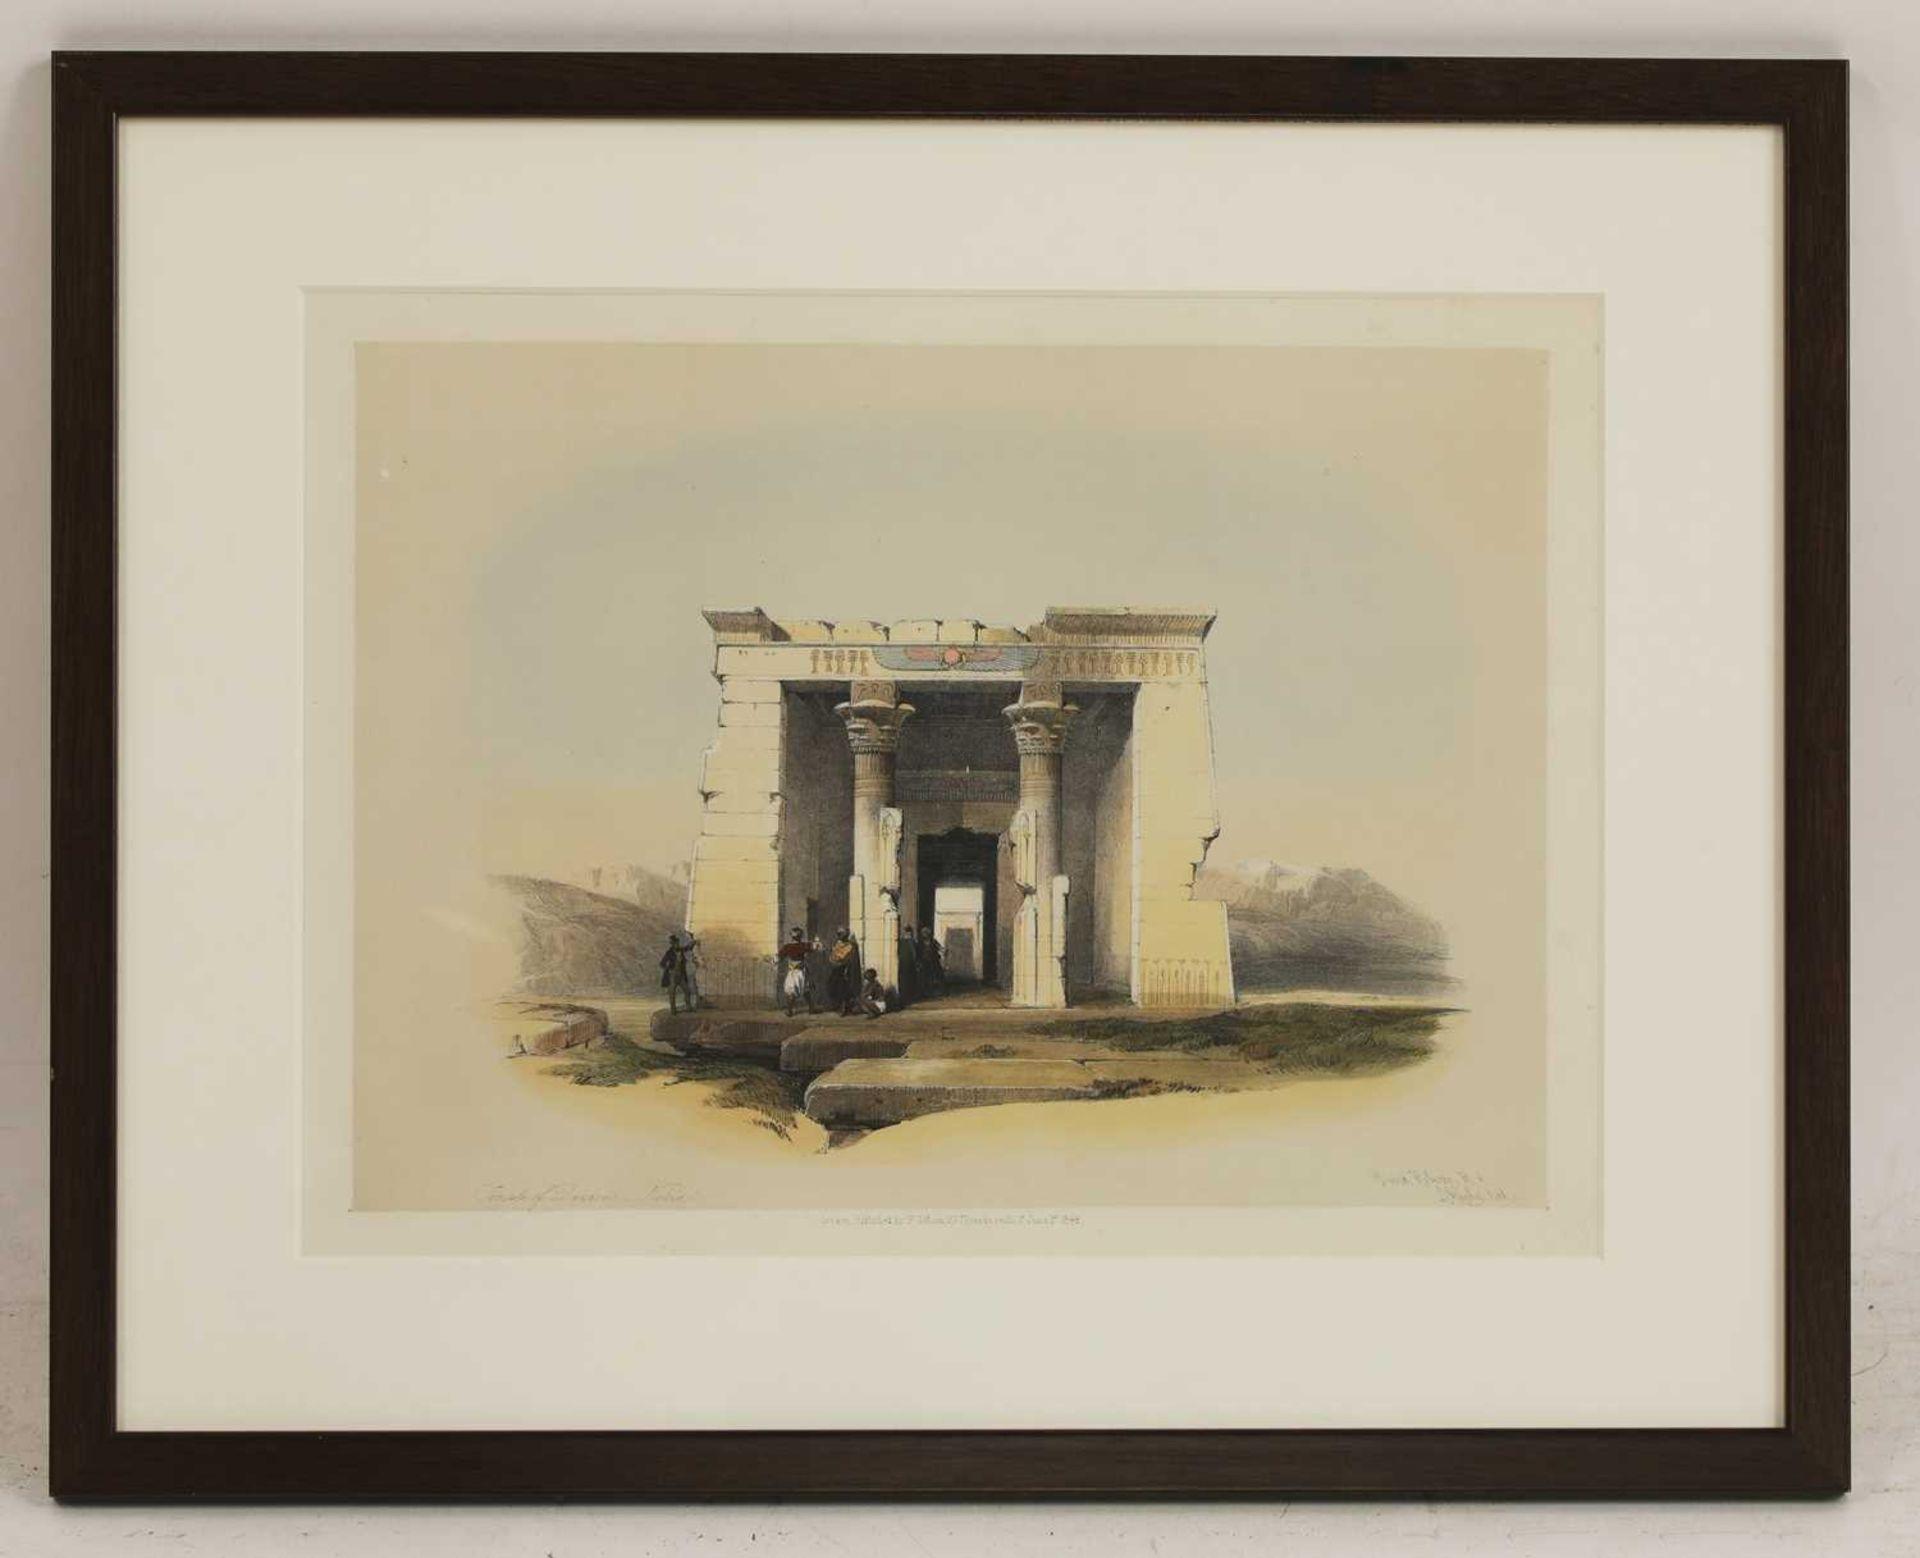 Louis Haghe after David Roberts RA (1796-1864) - Image 16 of 20